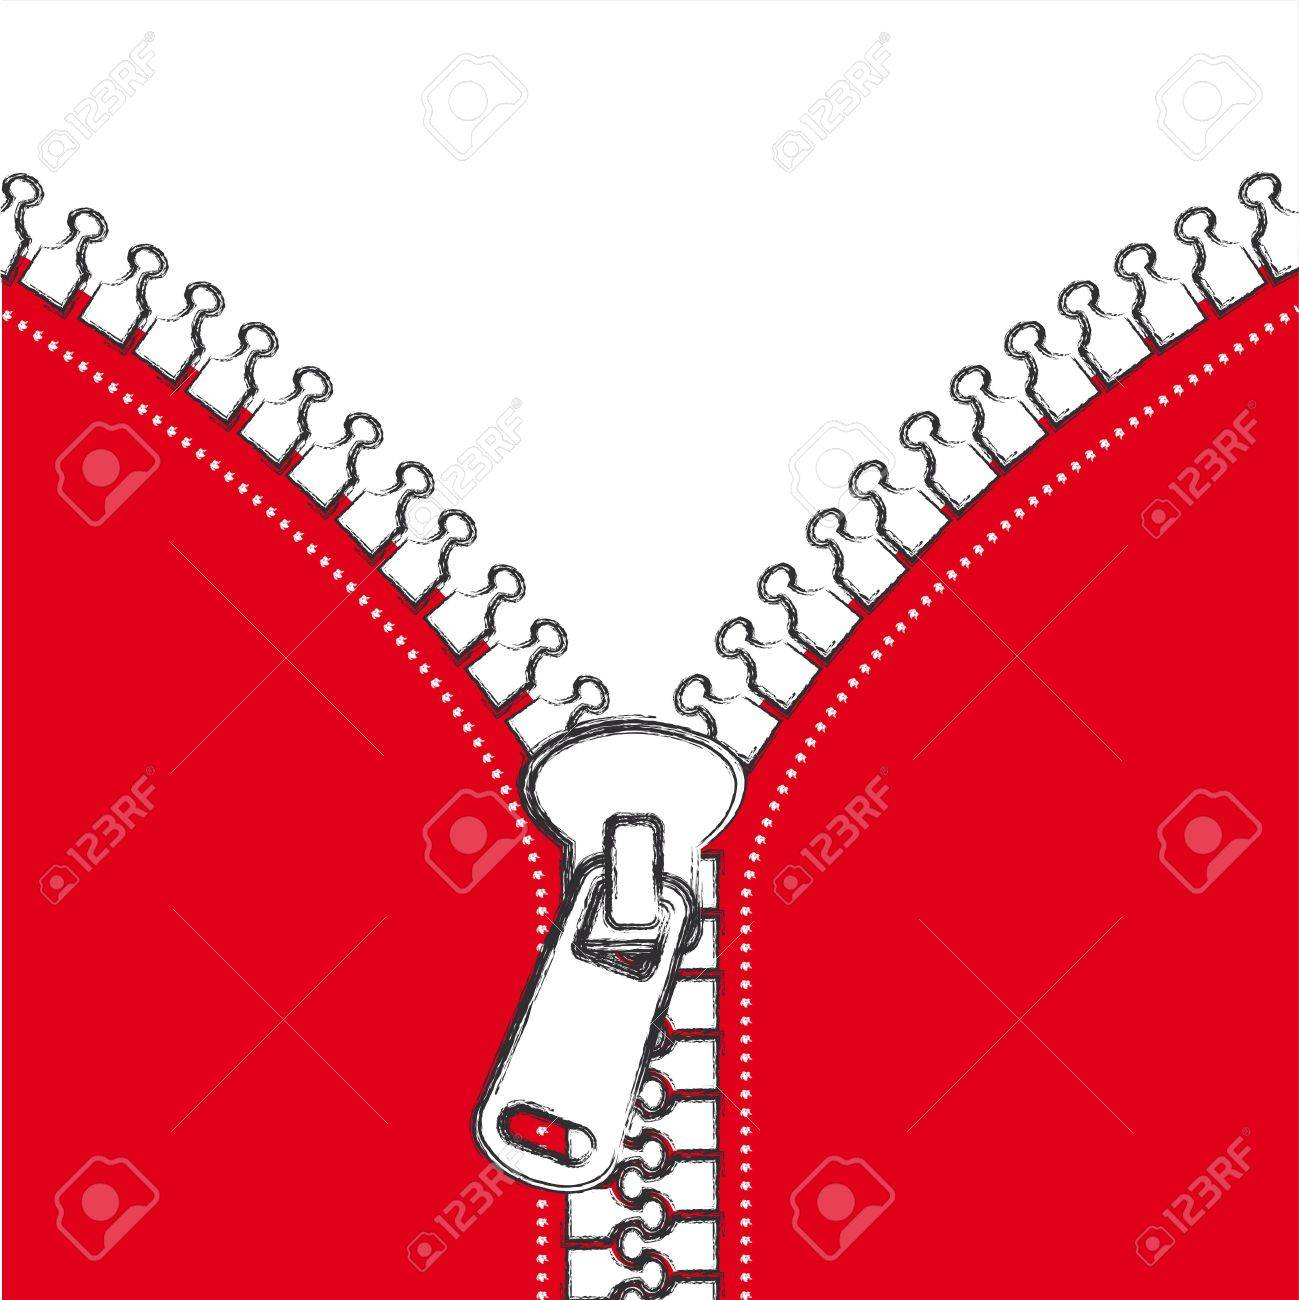 Jacket Zipper Clipart.